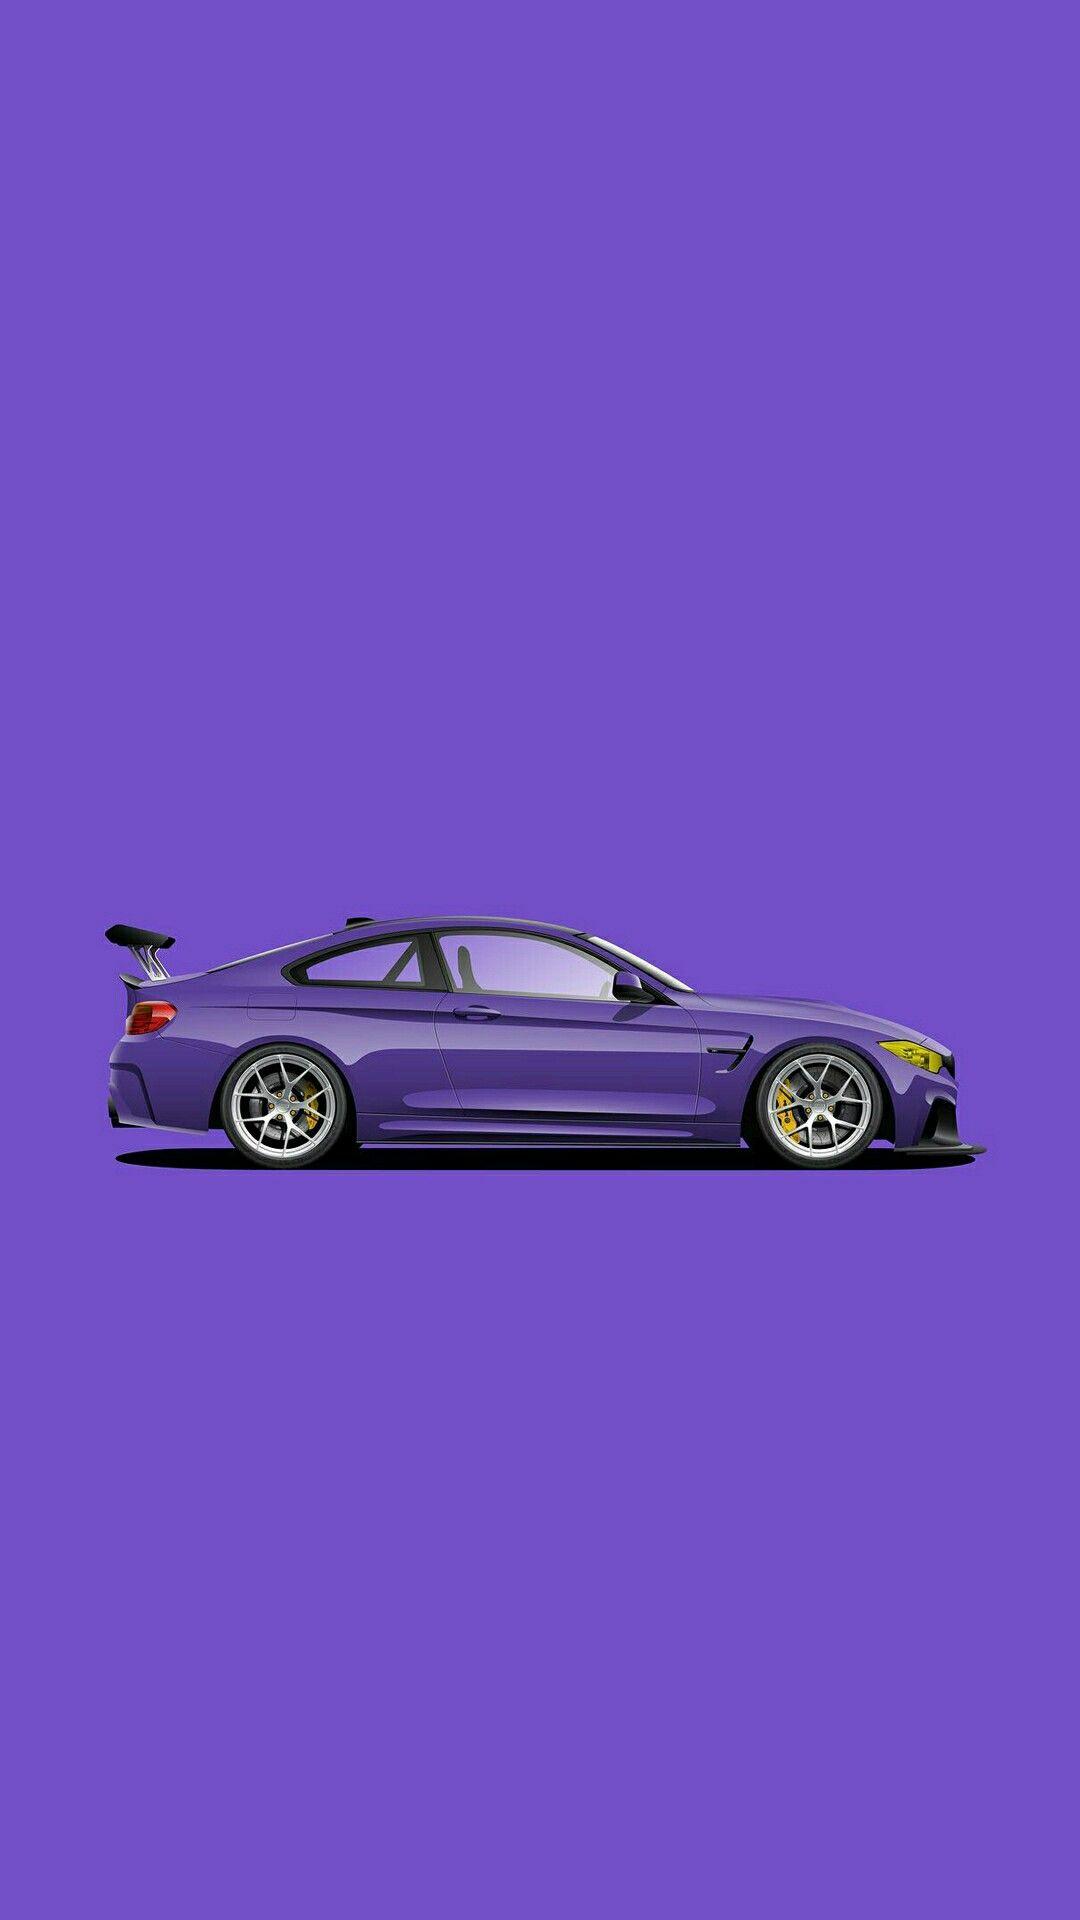 BLUE BMW ART Car iphone wallpaper, Bmw art, Car